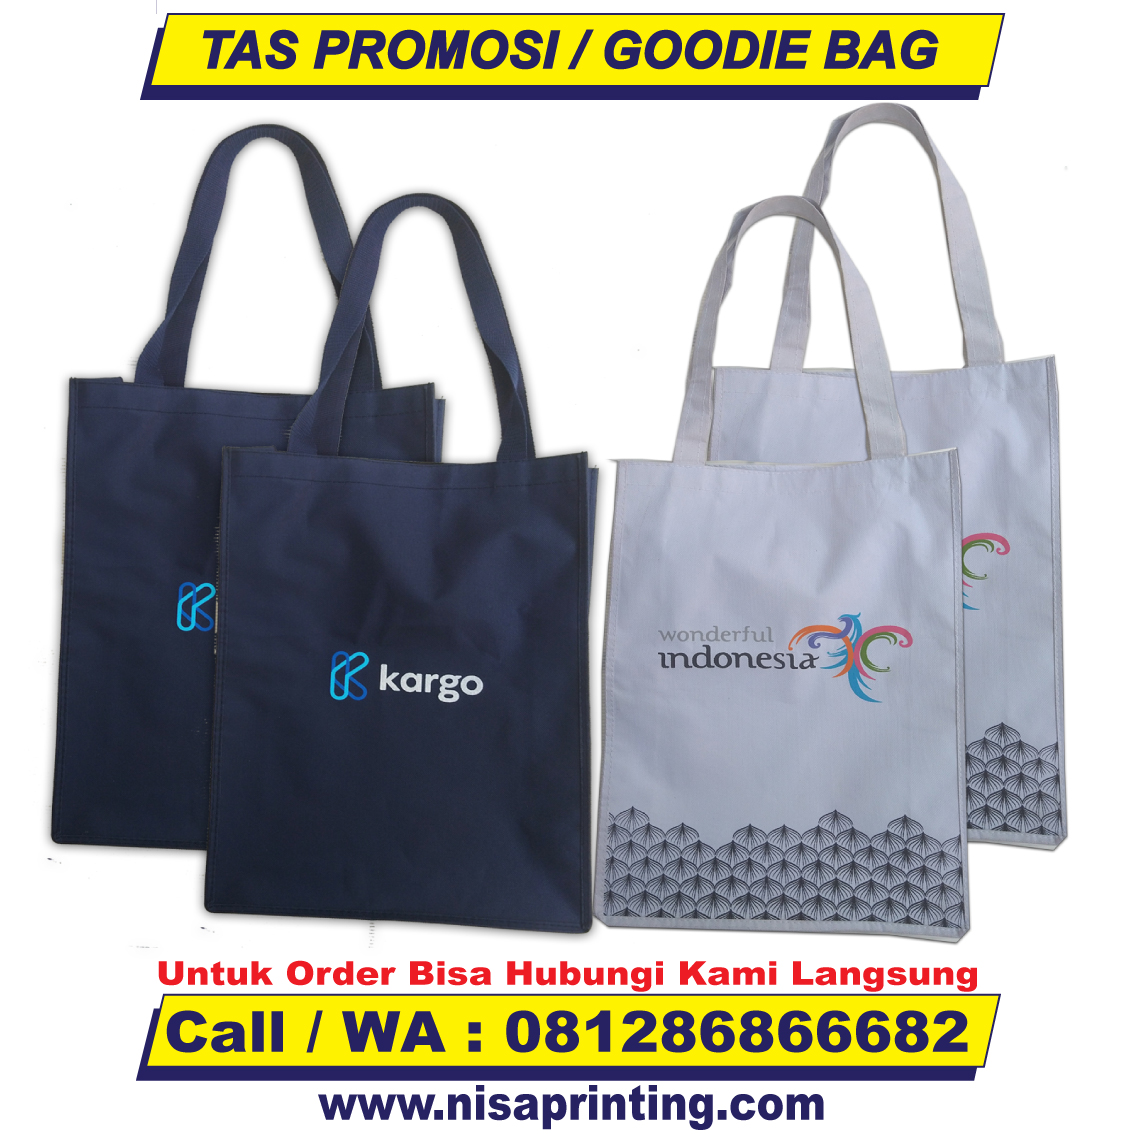 Produksi Tas Promosi Tas Spunbond Tas Goodie Bag Nisa Printing